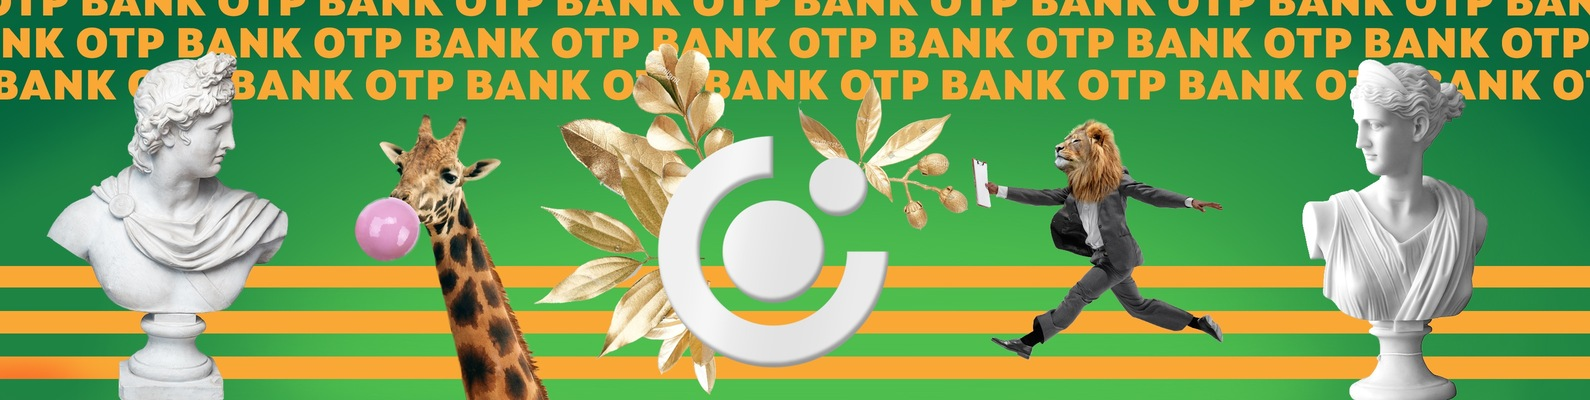 банки кредит онлайн отп хабаровск